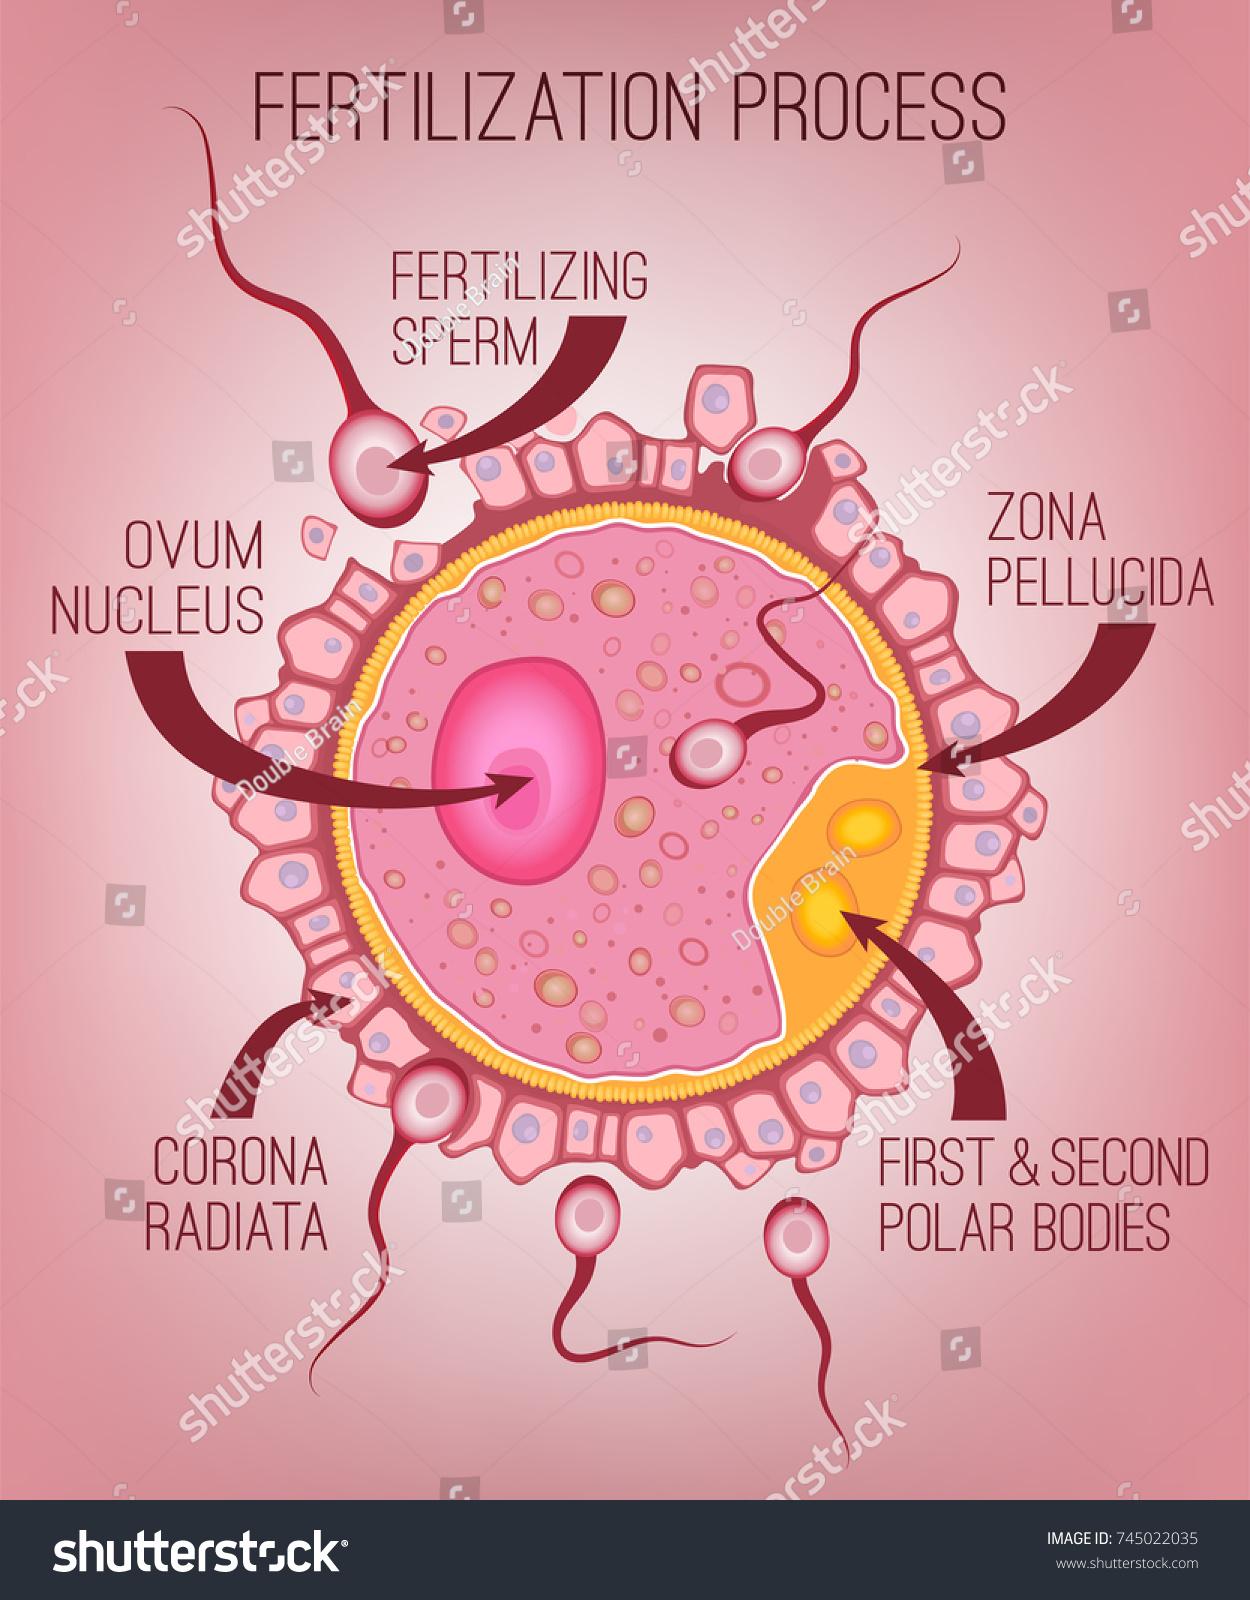 Ovum Structure Cytoplasm Nucleus Corona Radiata Stock Vector ...